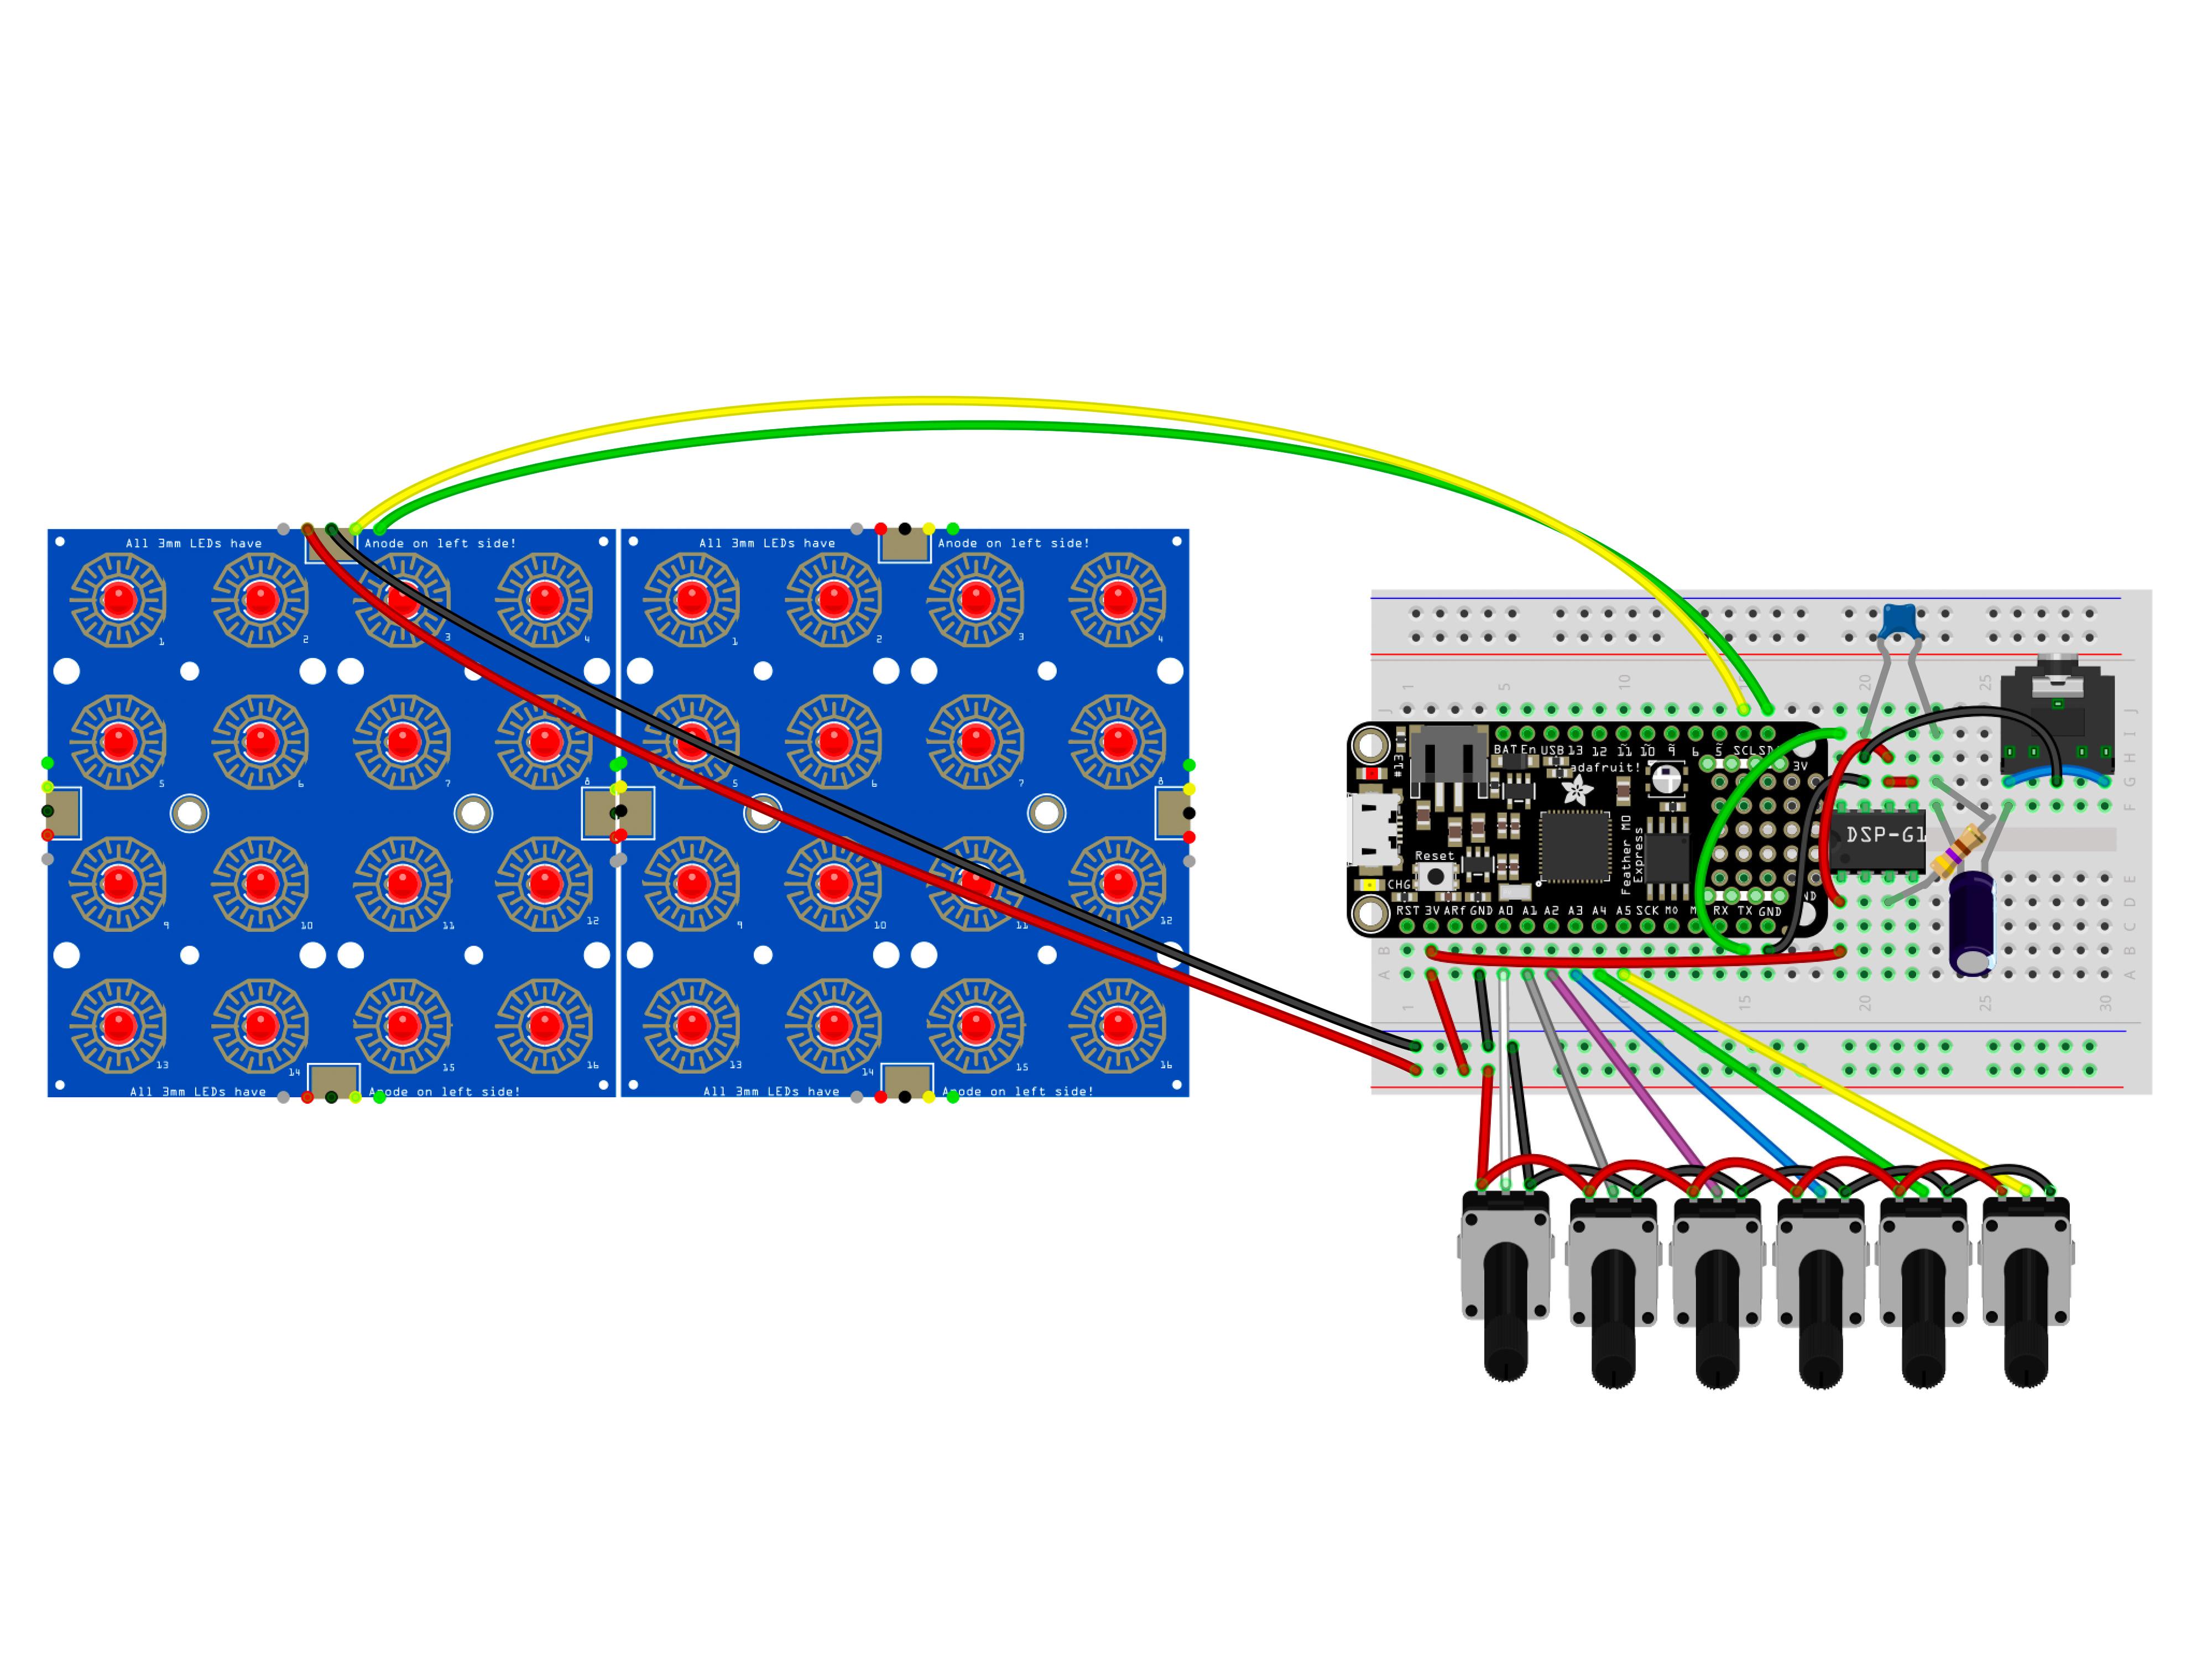 microcontrollers_diagram02.jpg